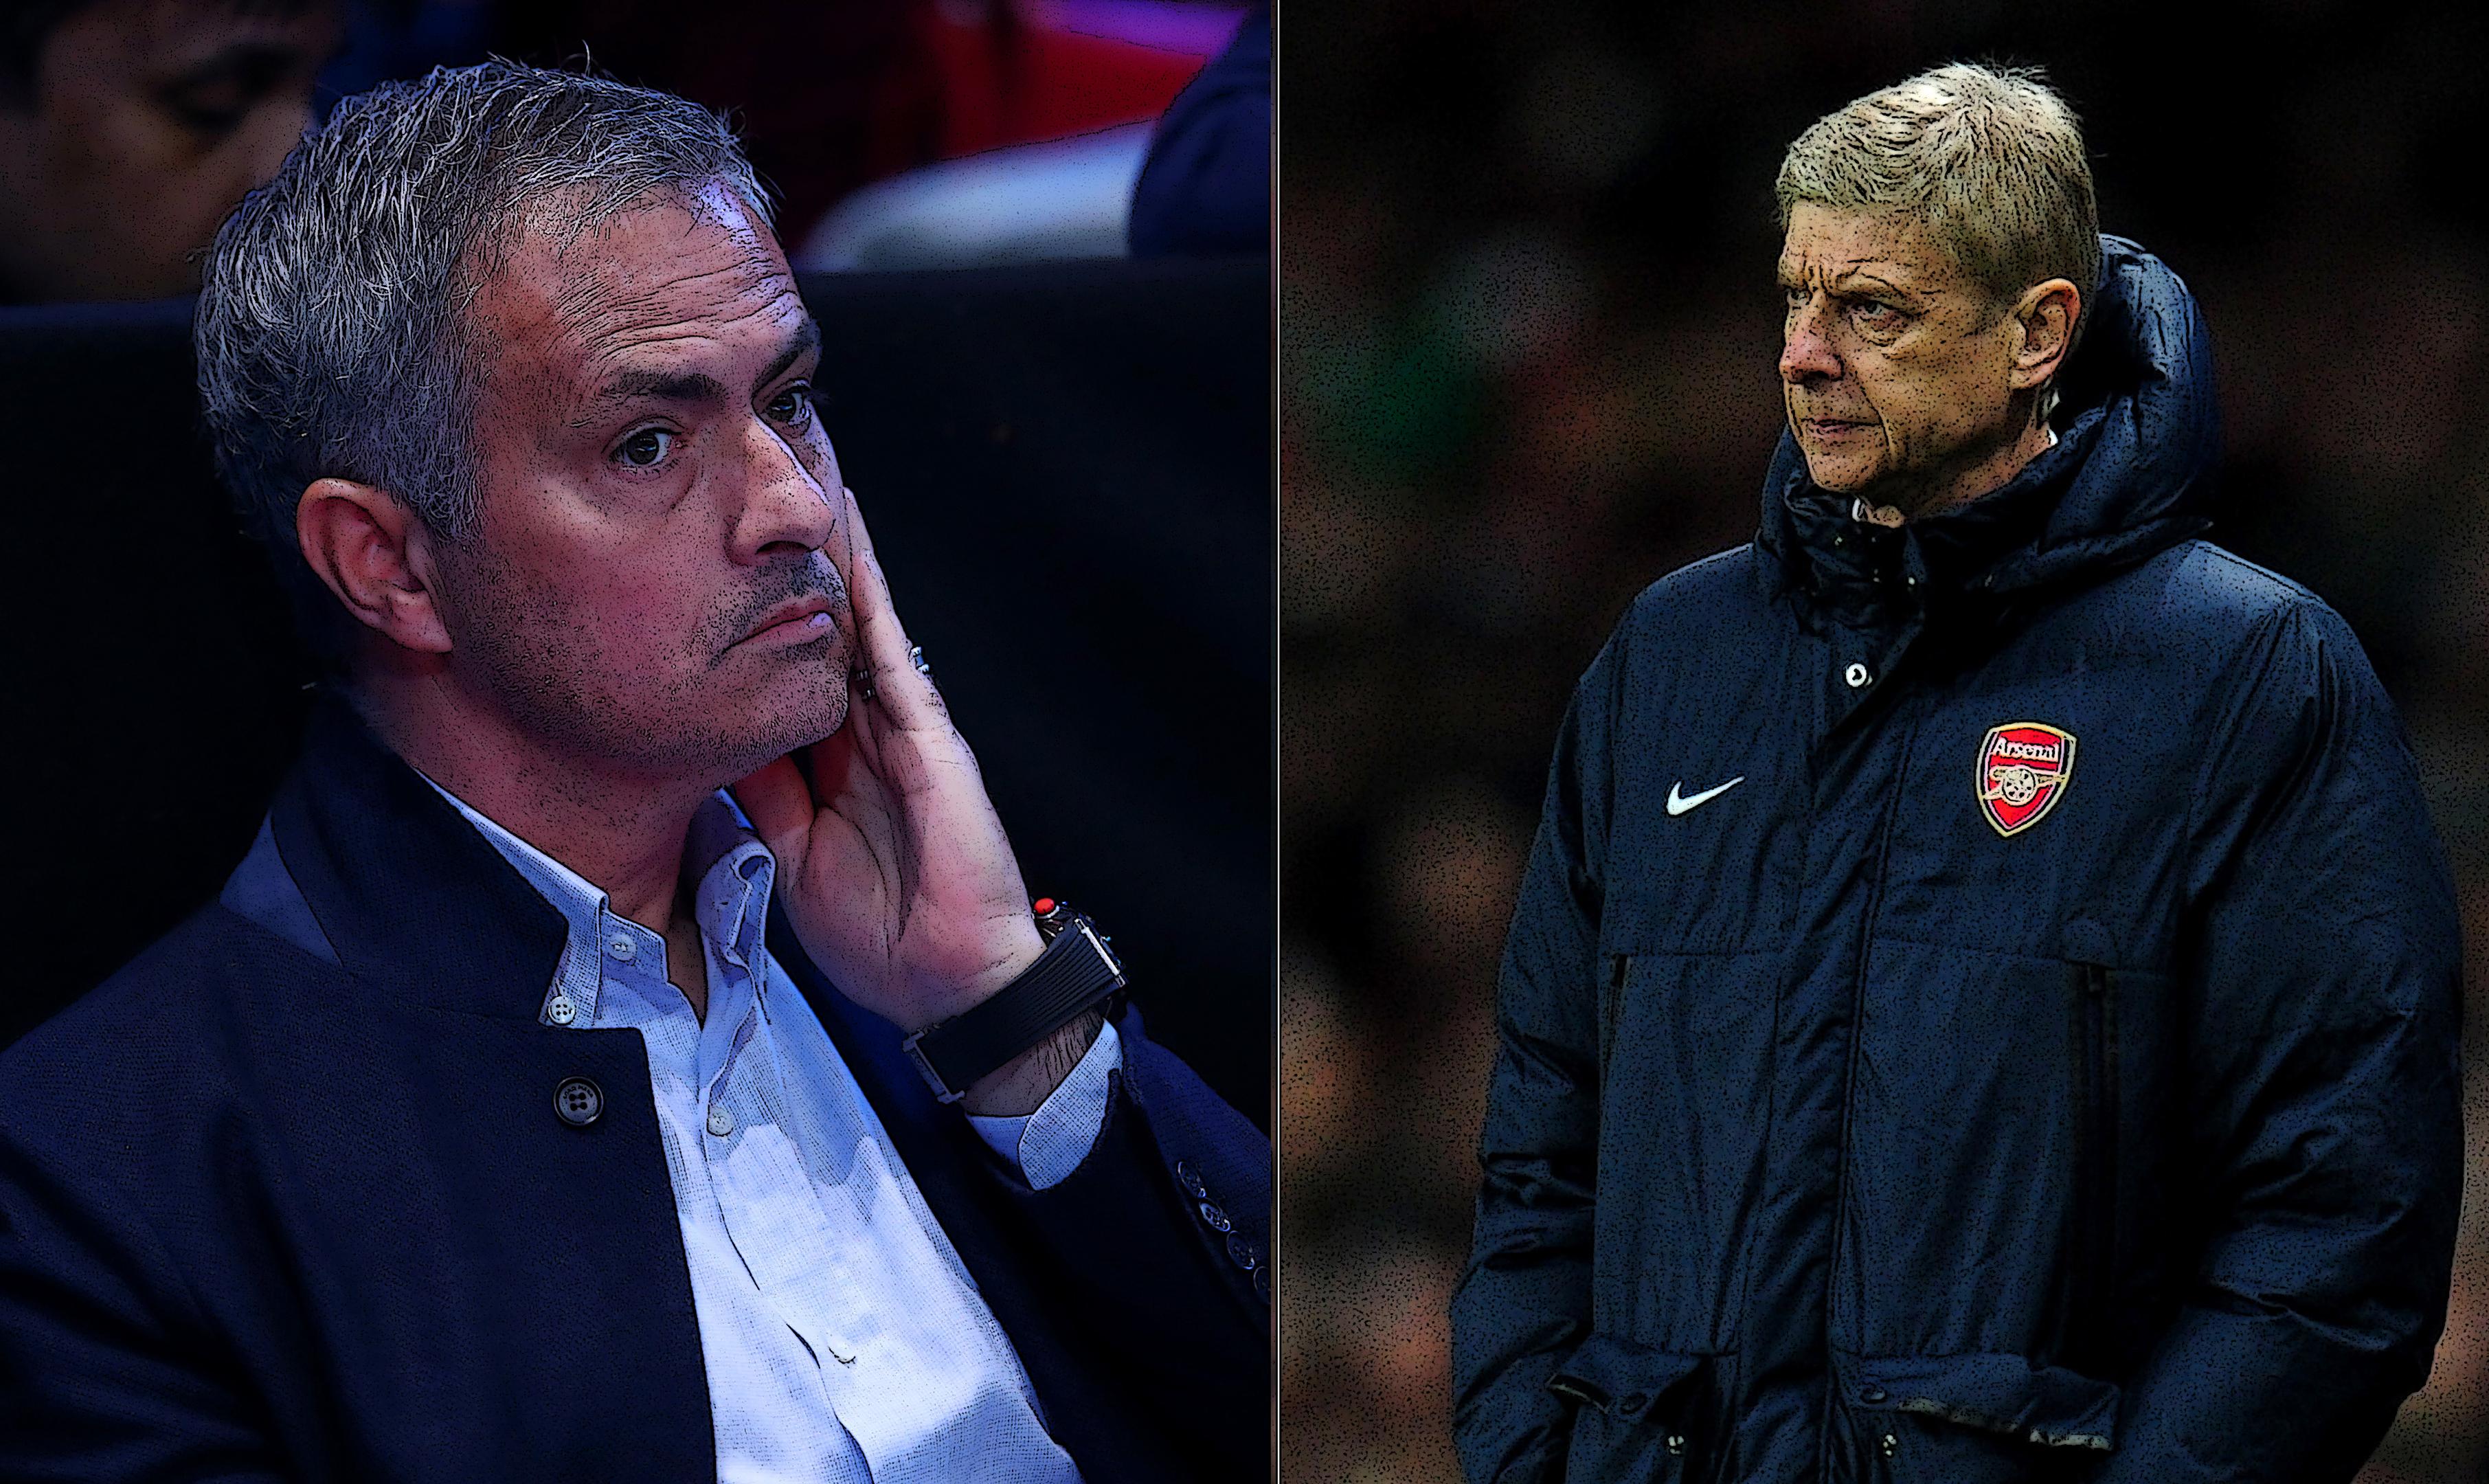 Mourinho (left) and Wenger (Shaun Botterill &Clive Brunskill/Getty Images)